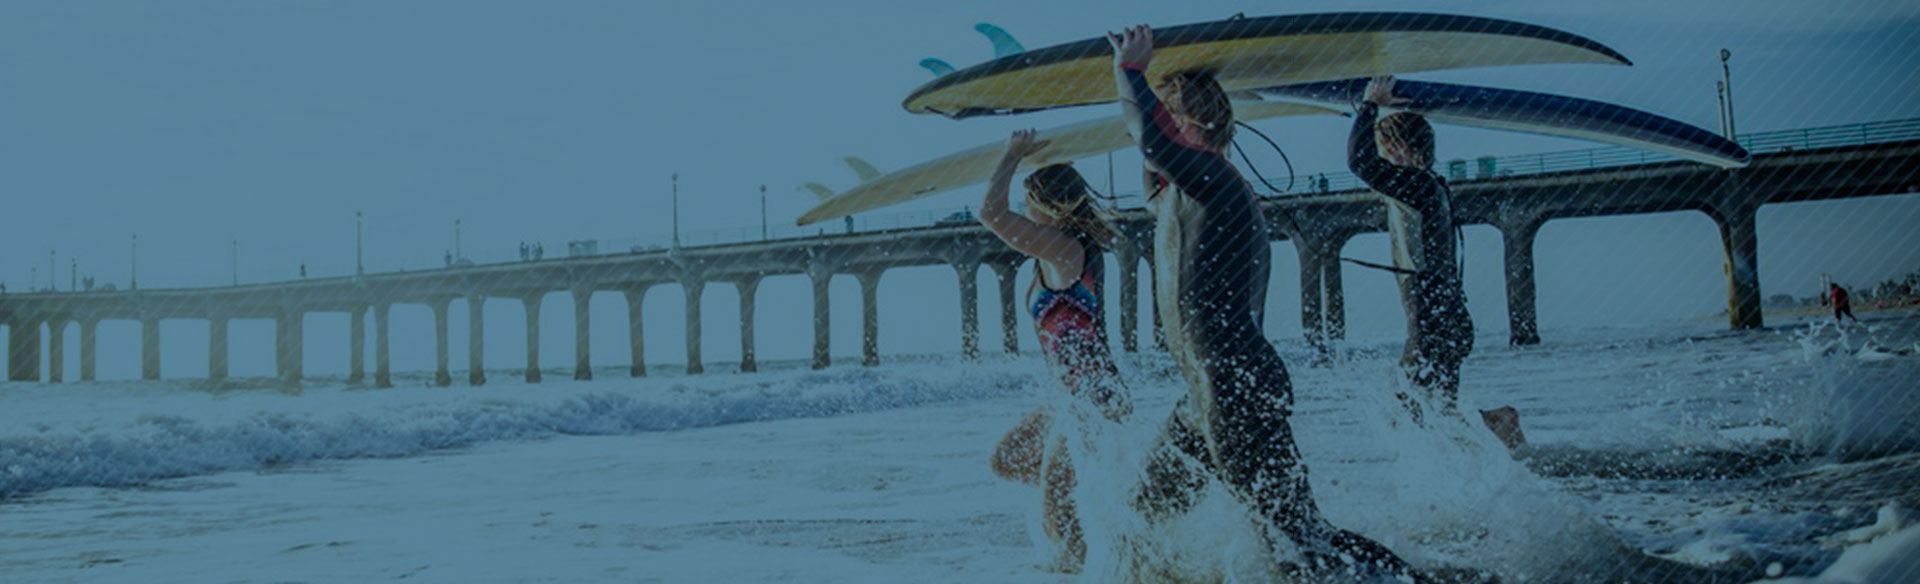 ingles-com-surf